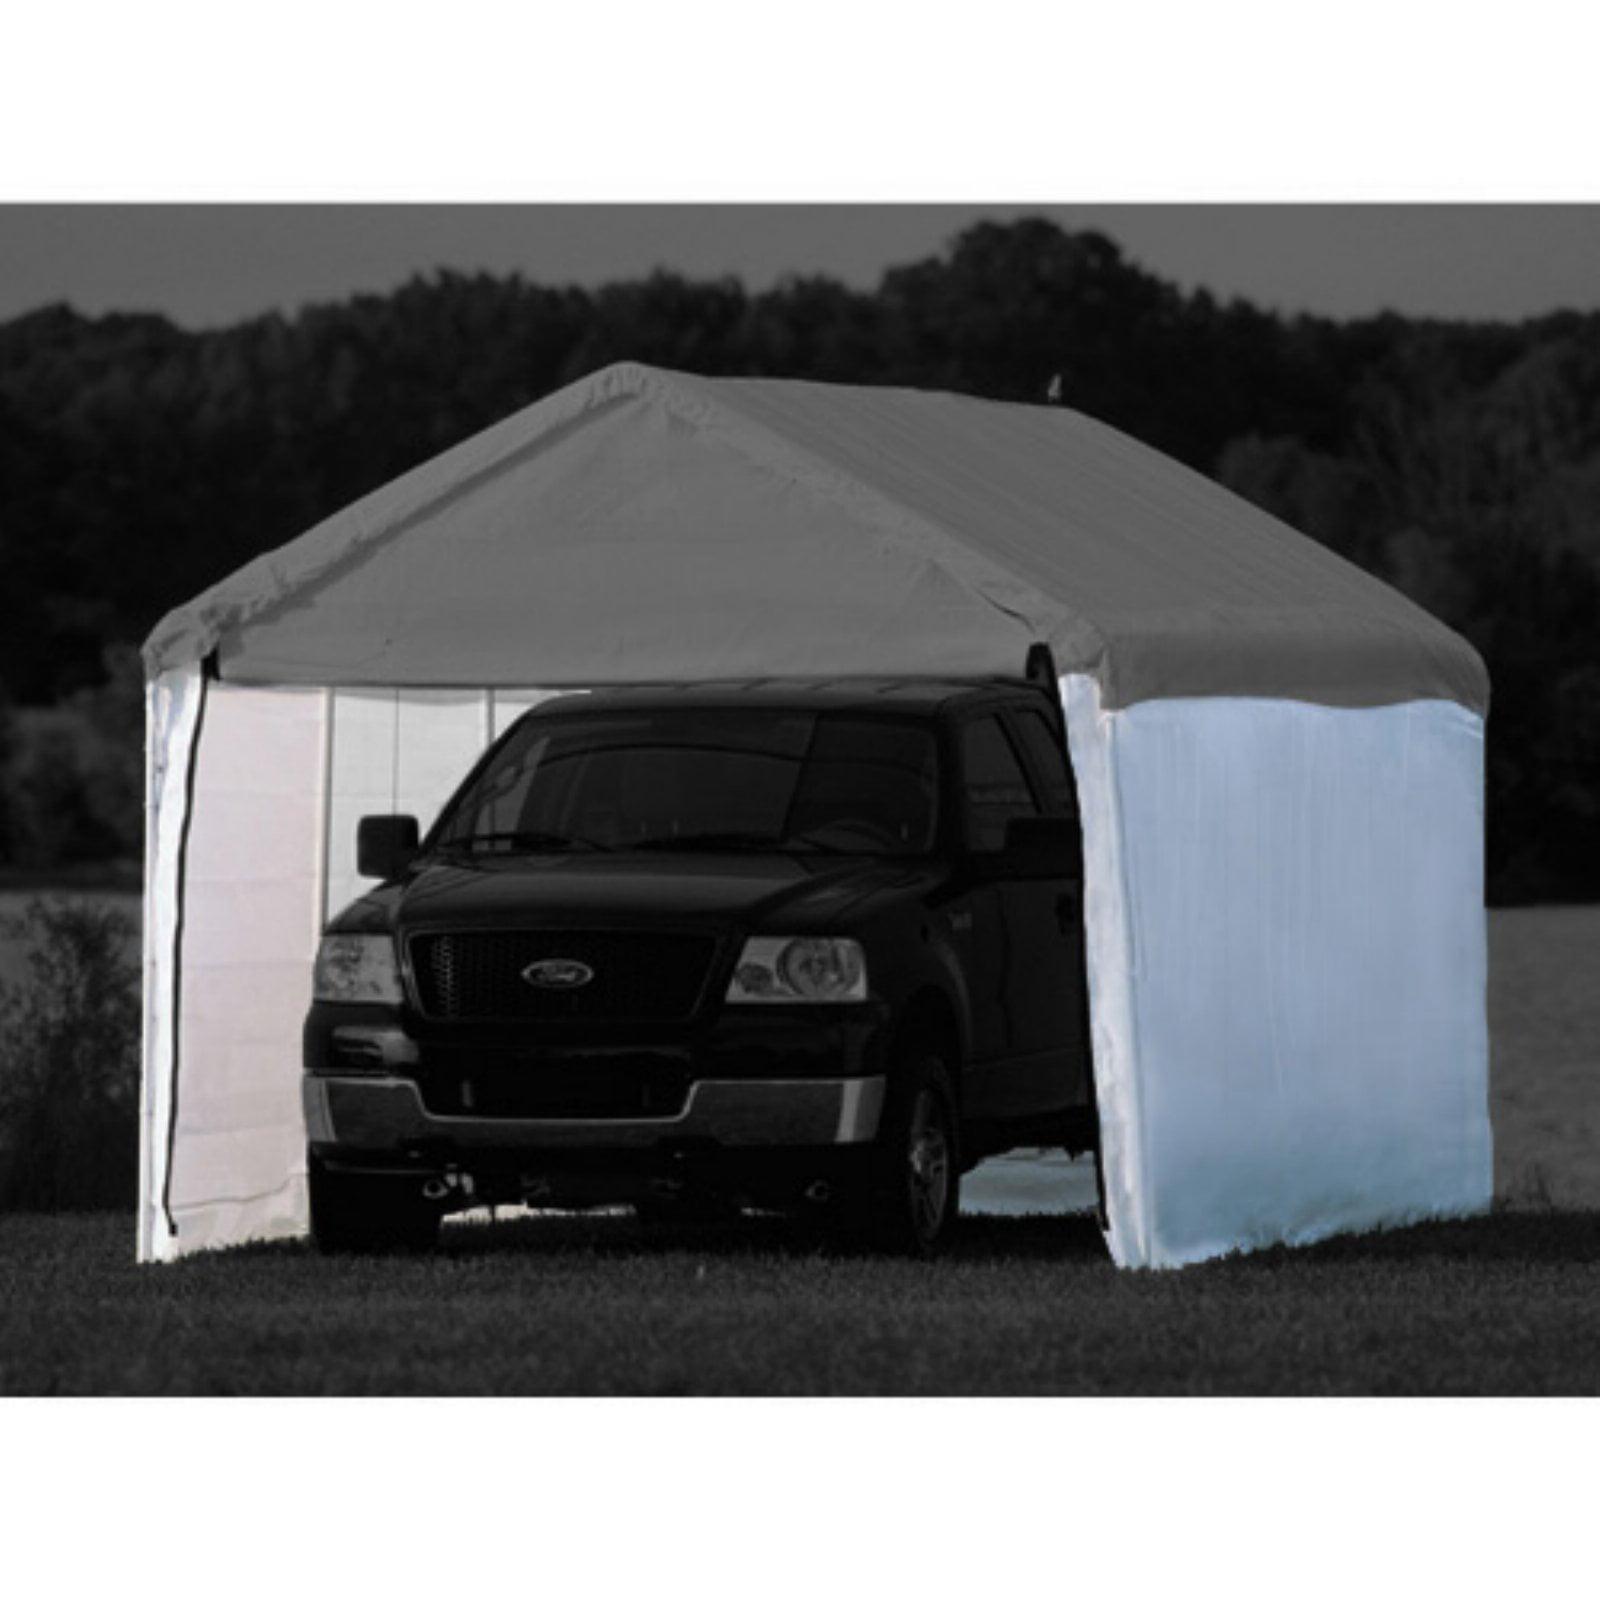 "ShelterLogic Super Max 10' x 20' White Canopy Enclosure Kit Fits 2"" Frame"